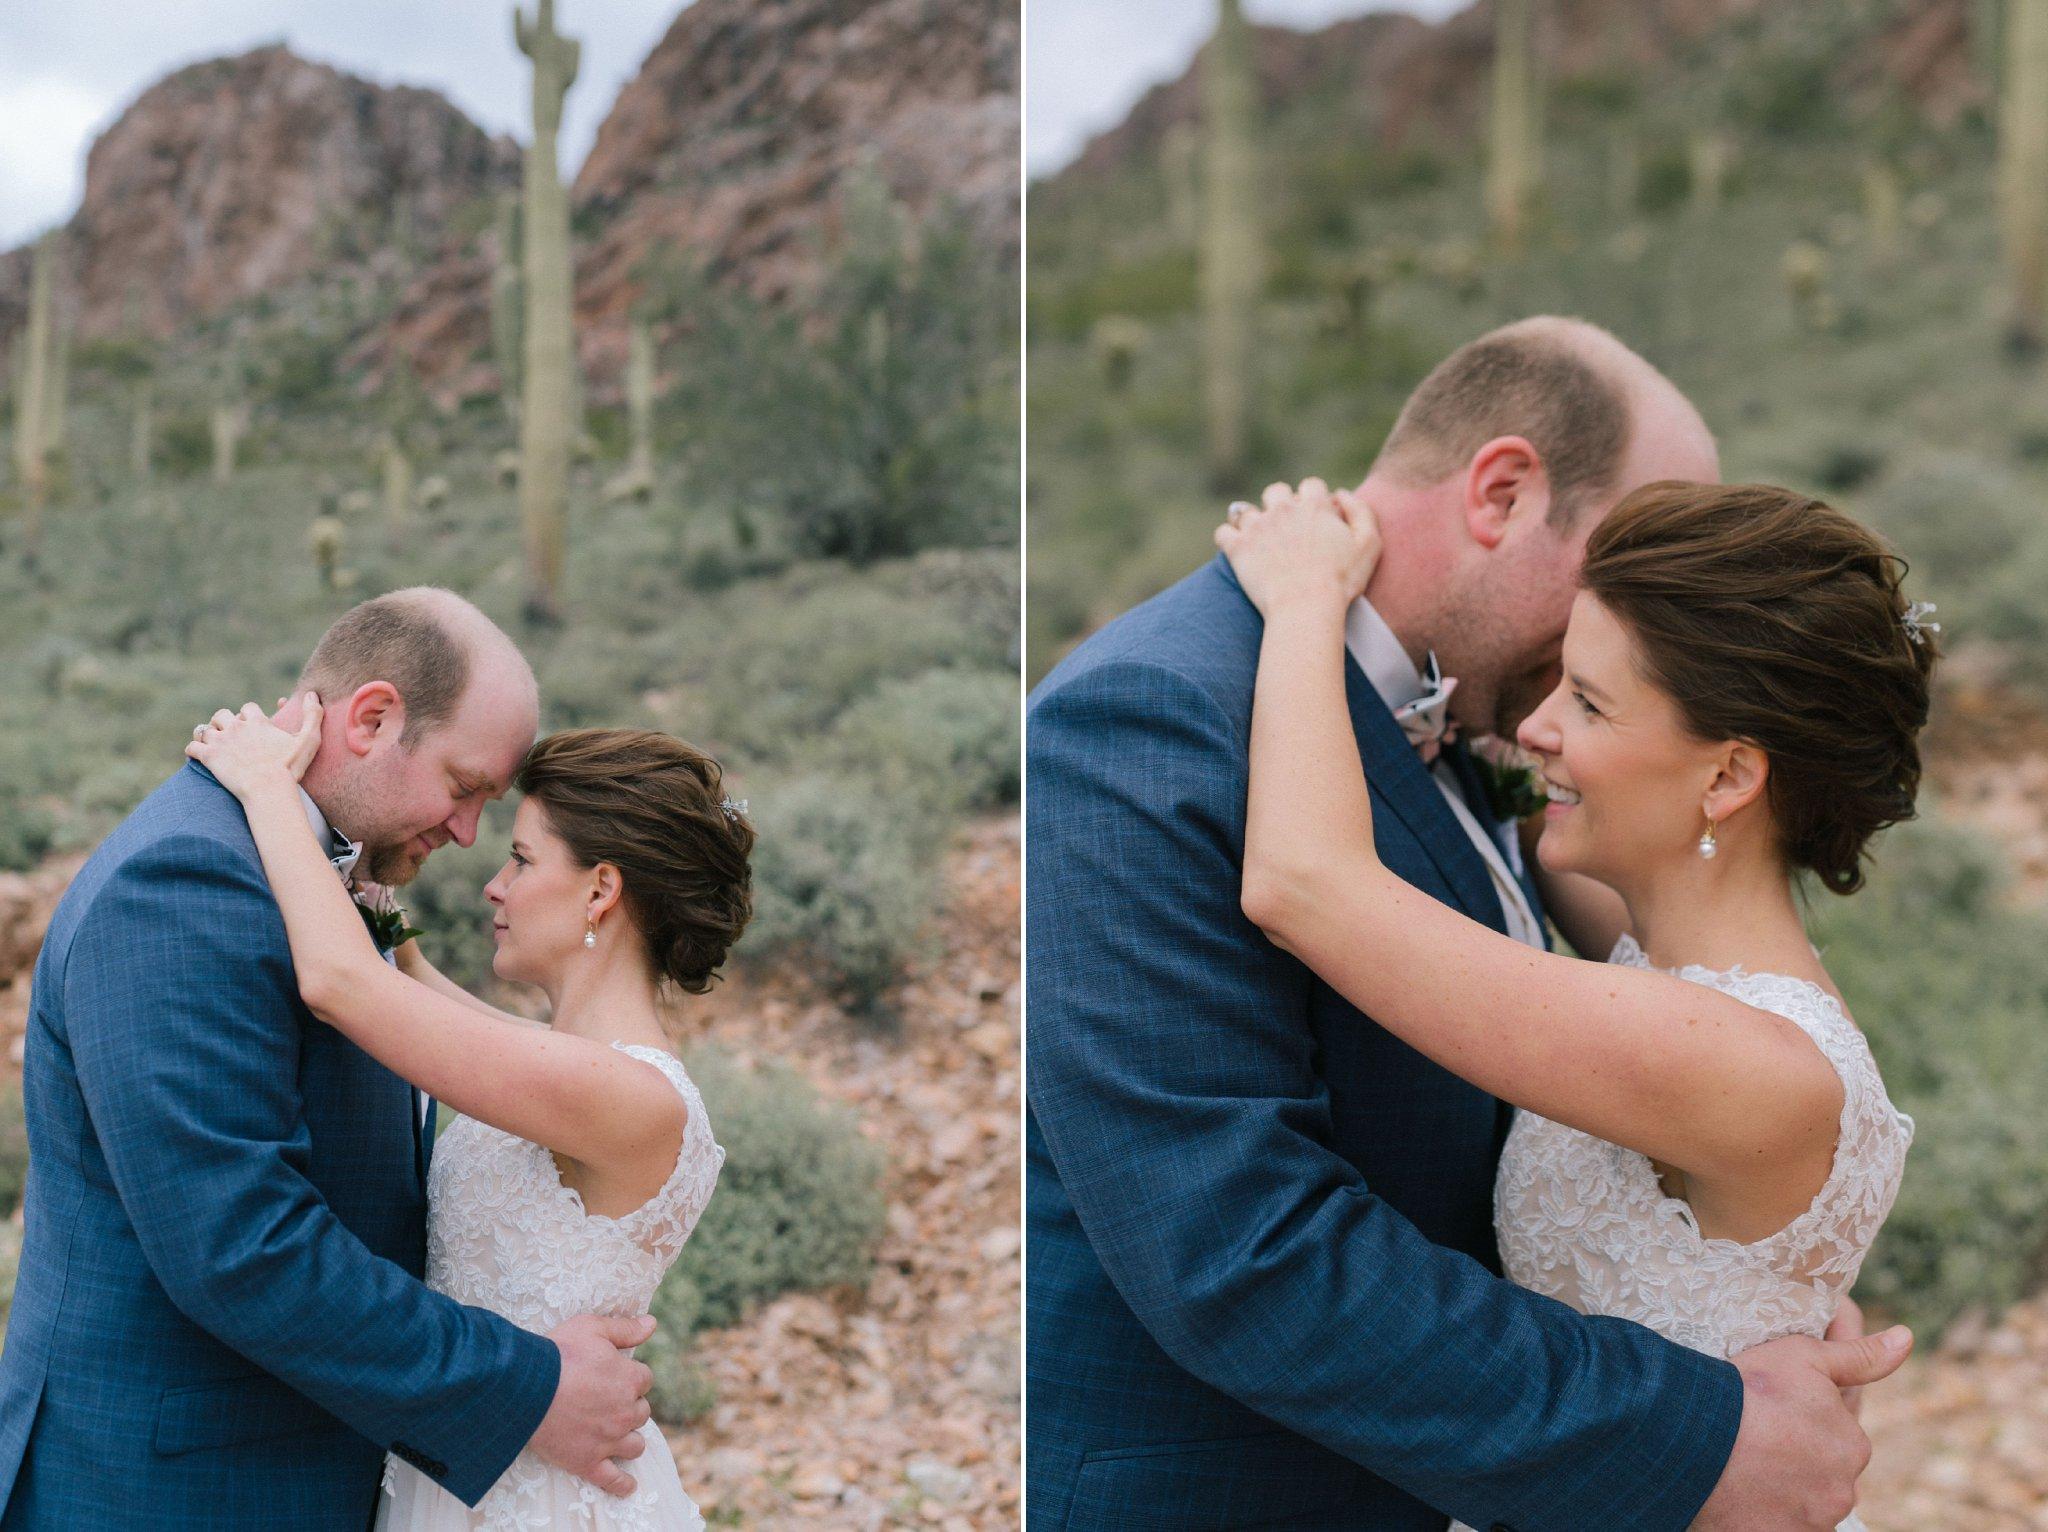 desert bride & groom portraits in Arizona at Gold Canyon Golf Resort